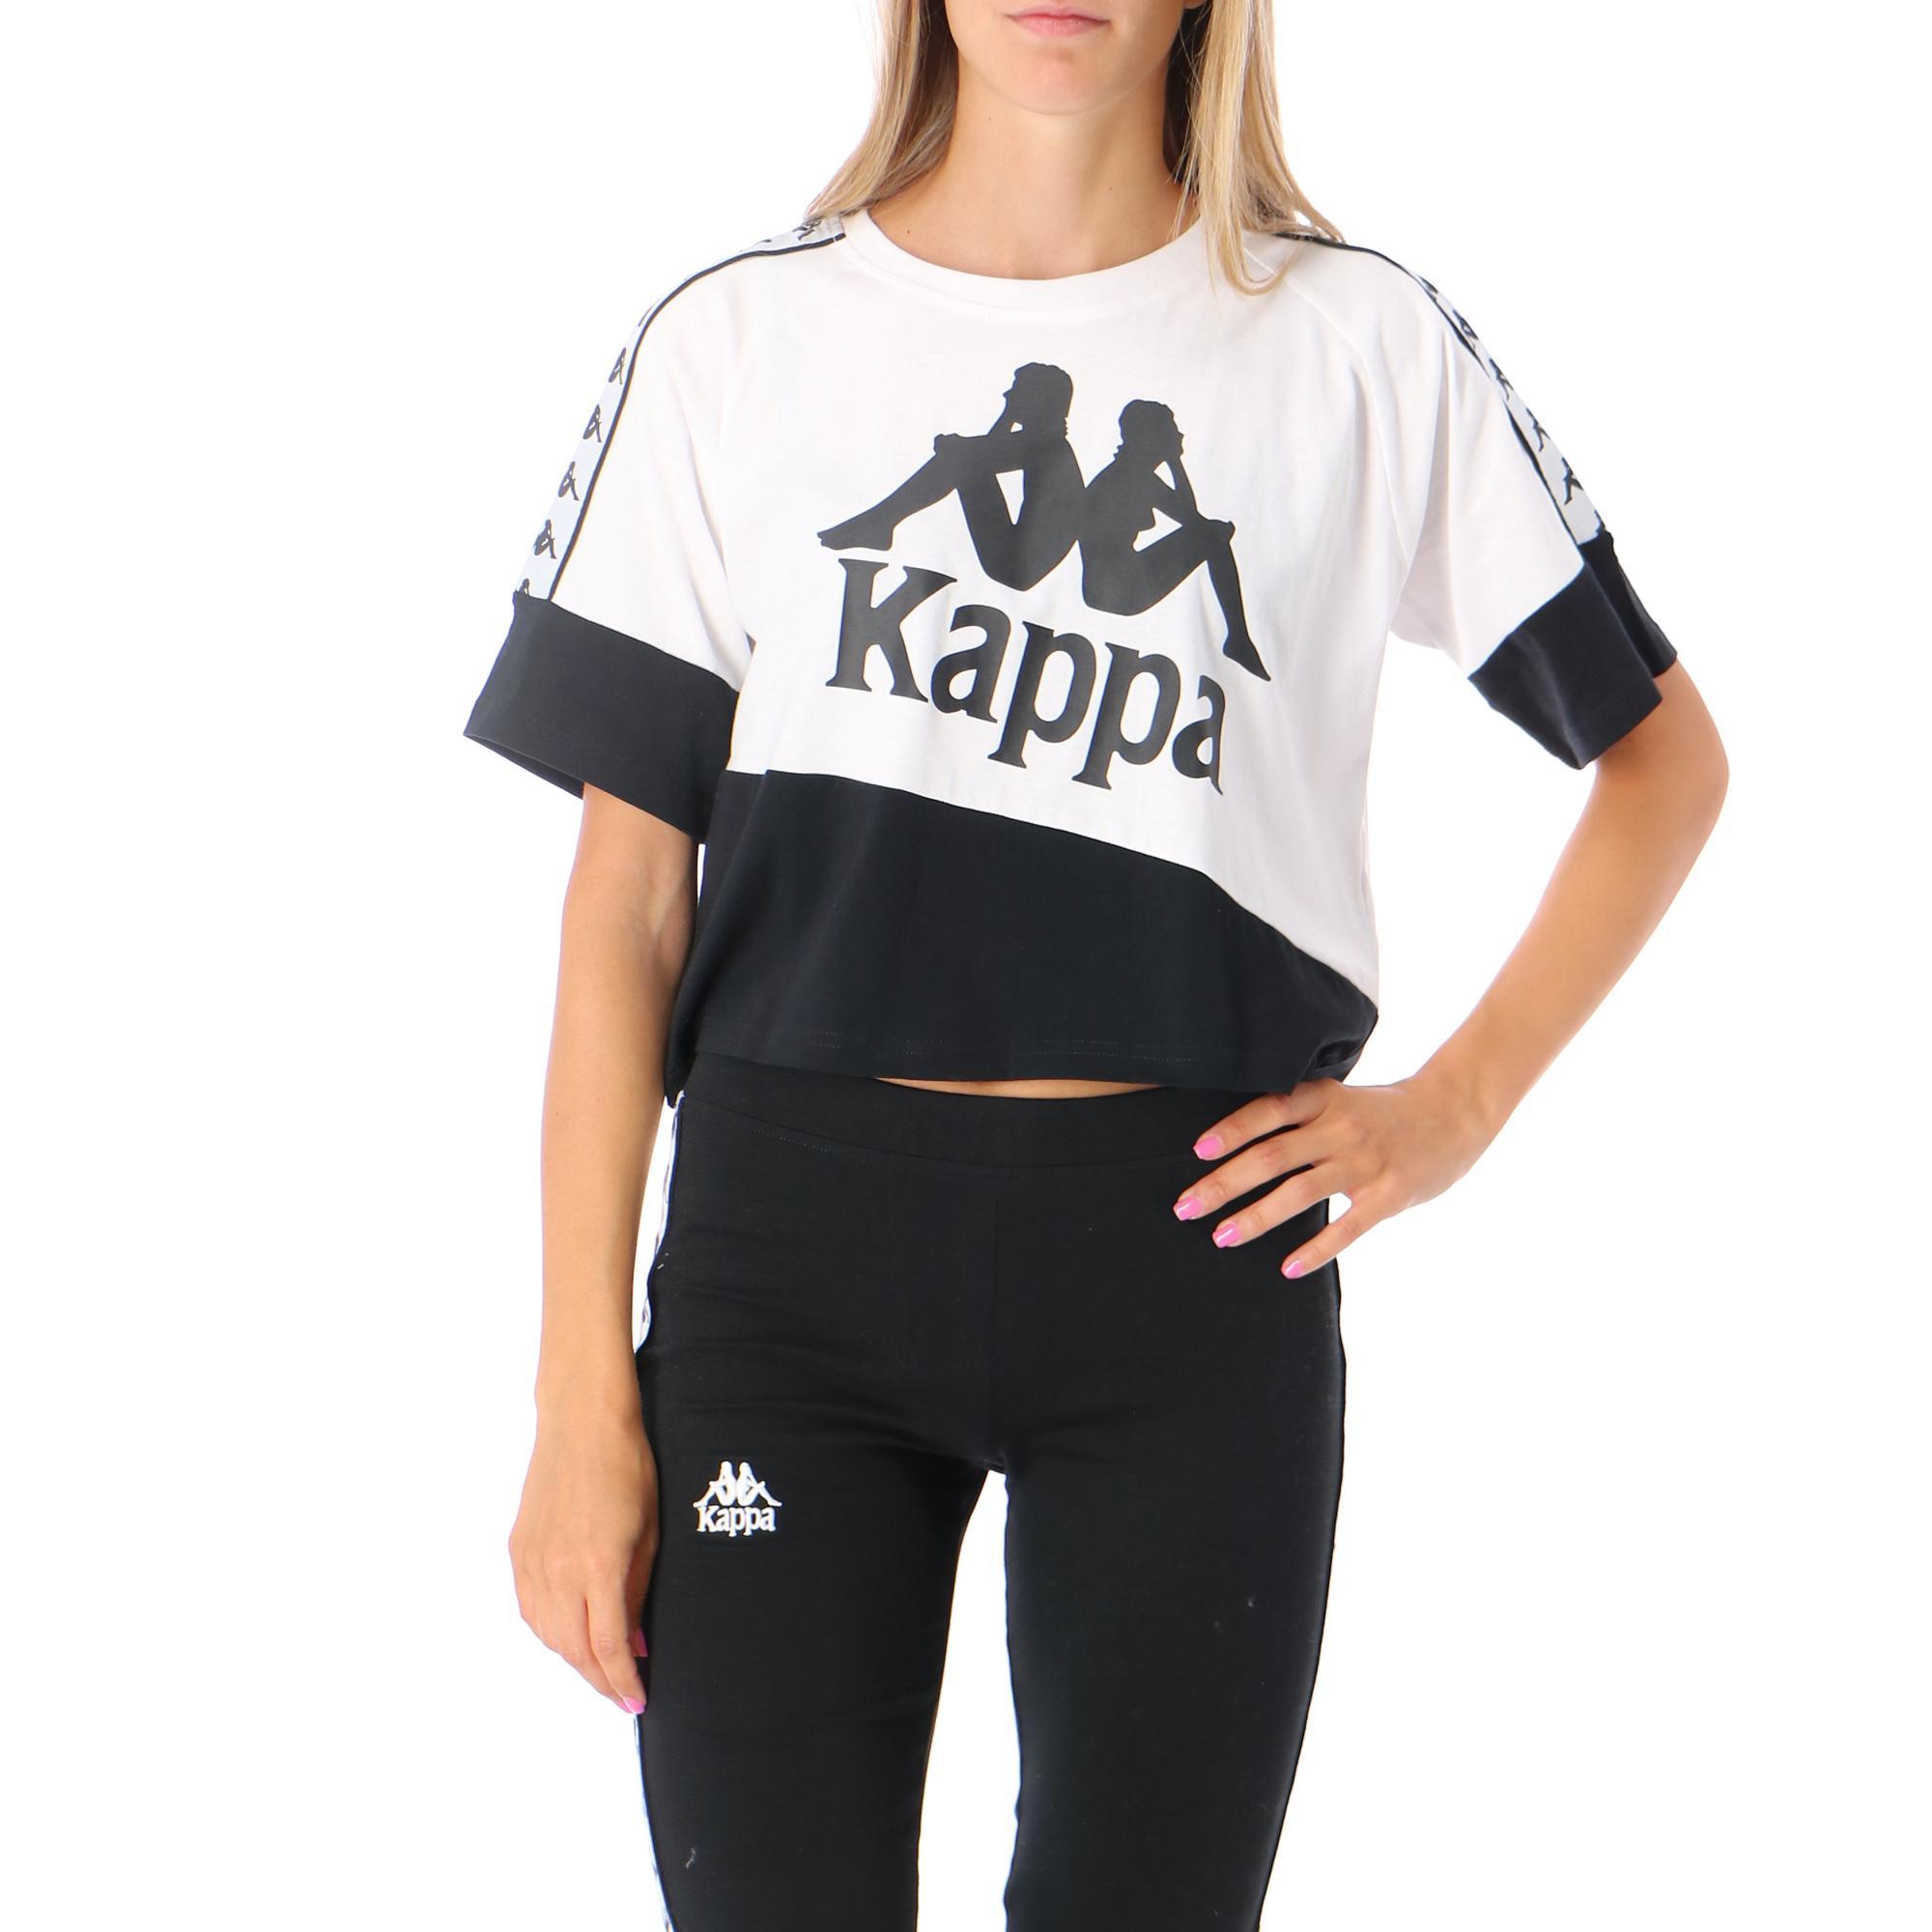 Kappa 222 Banda Balimnos White black WHITE